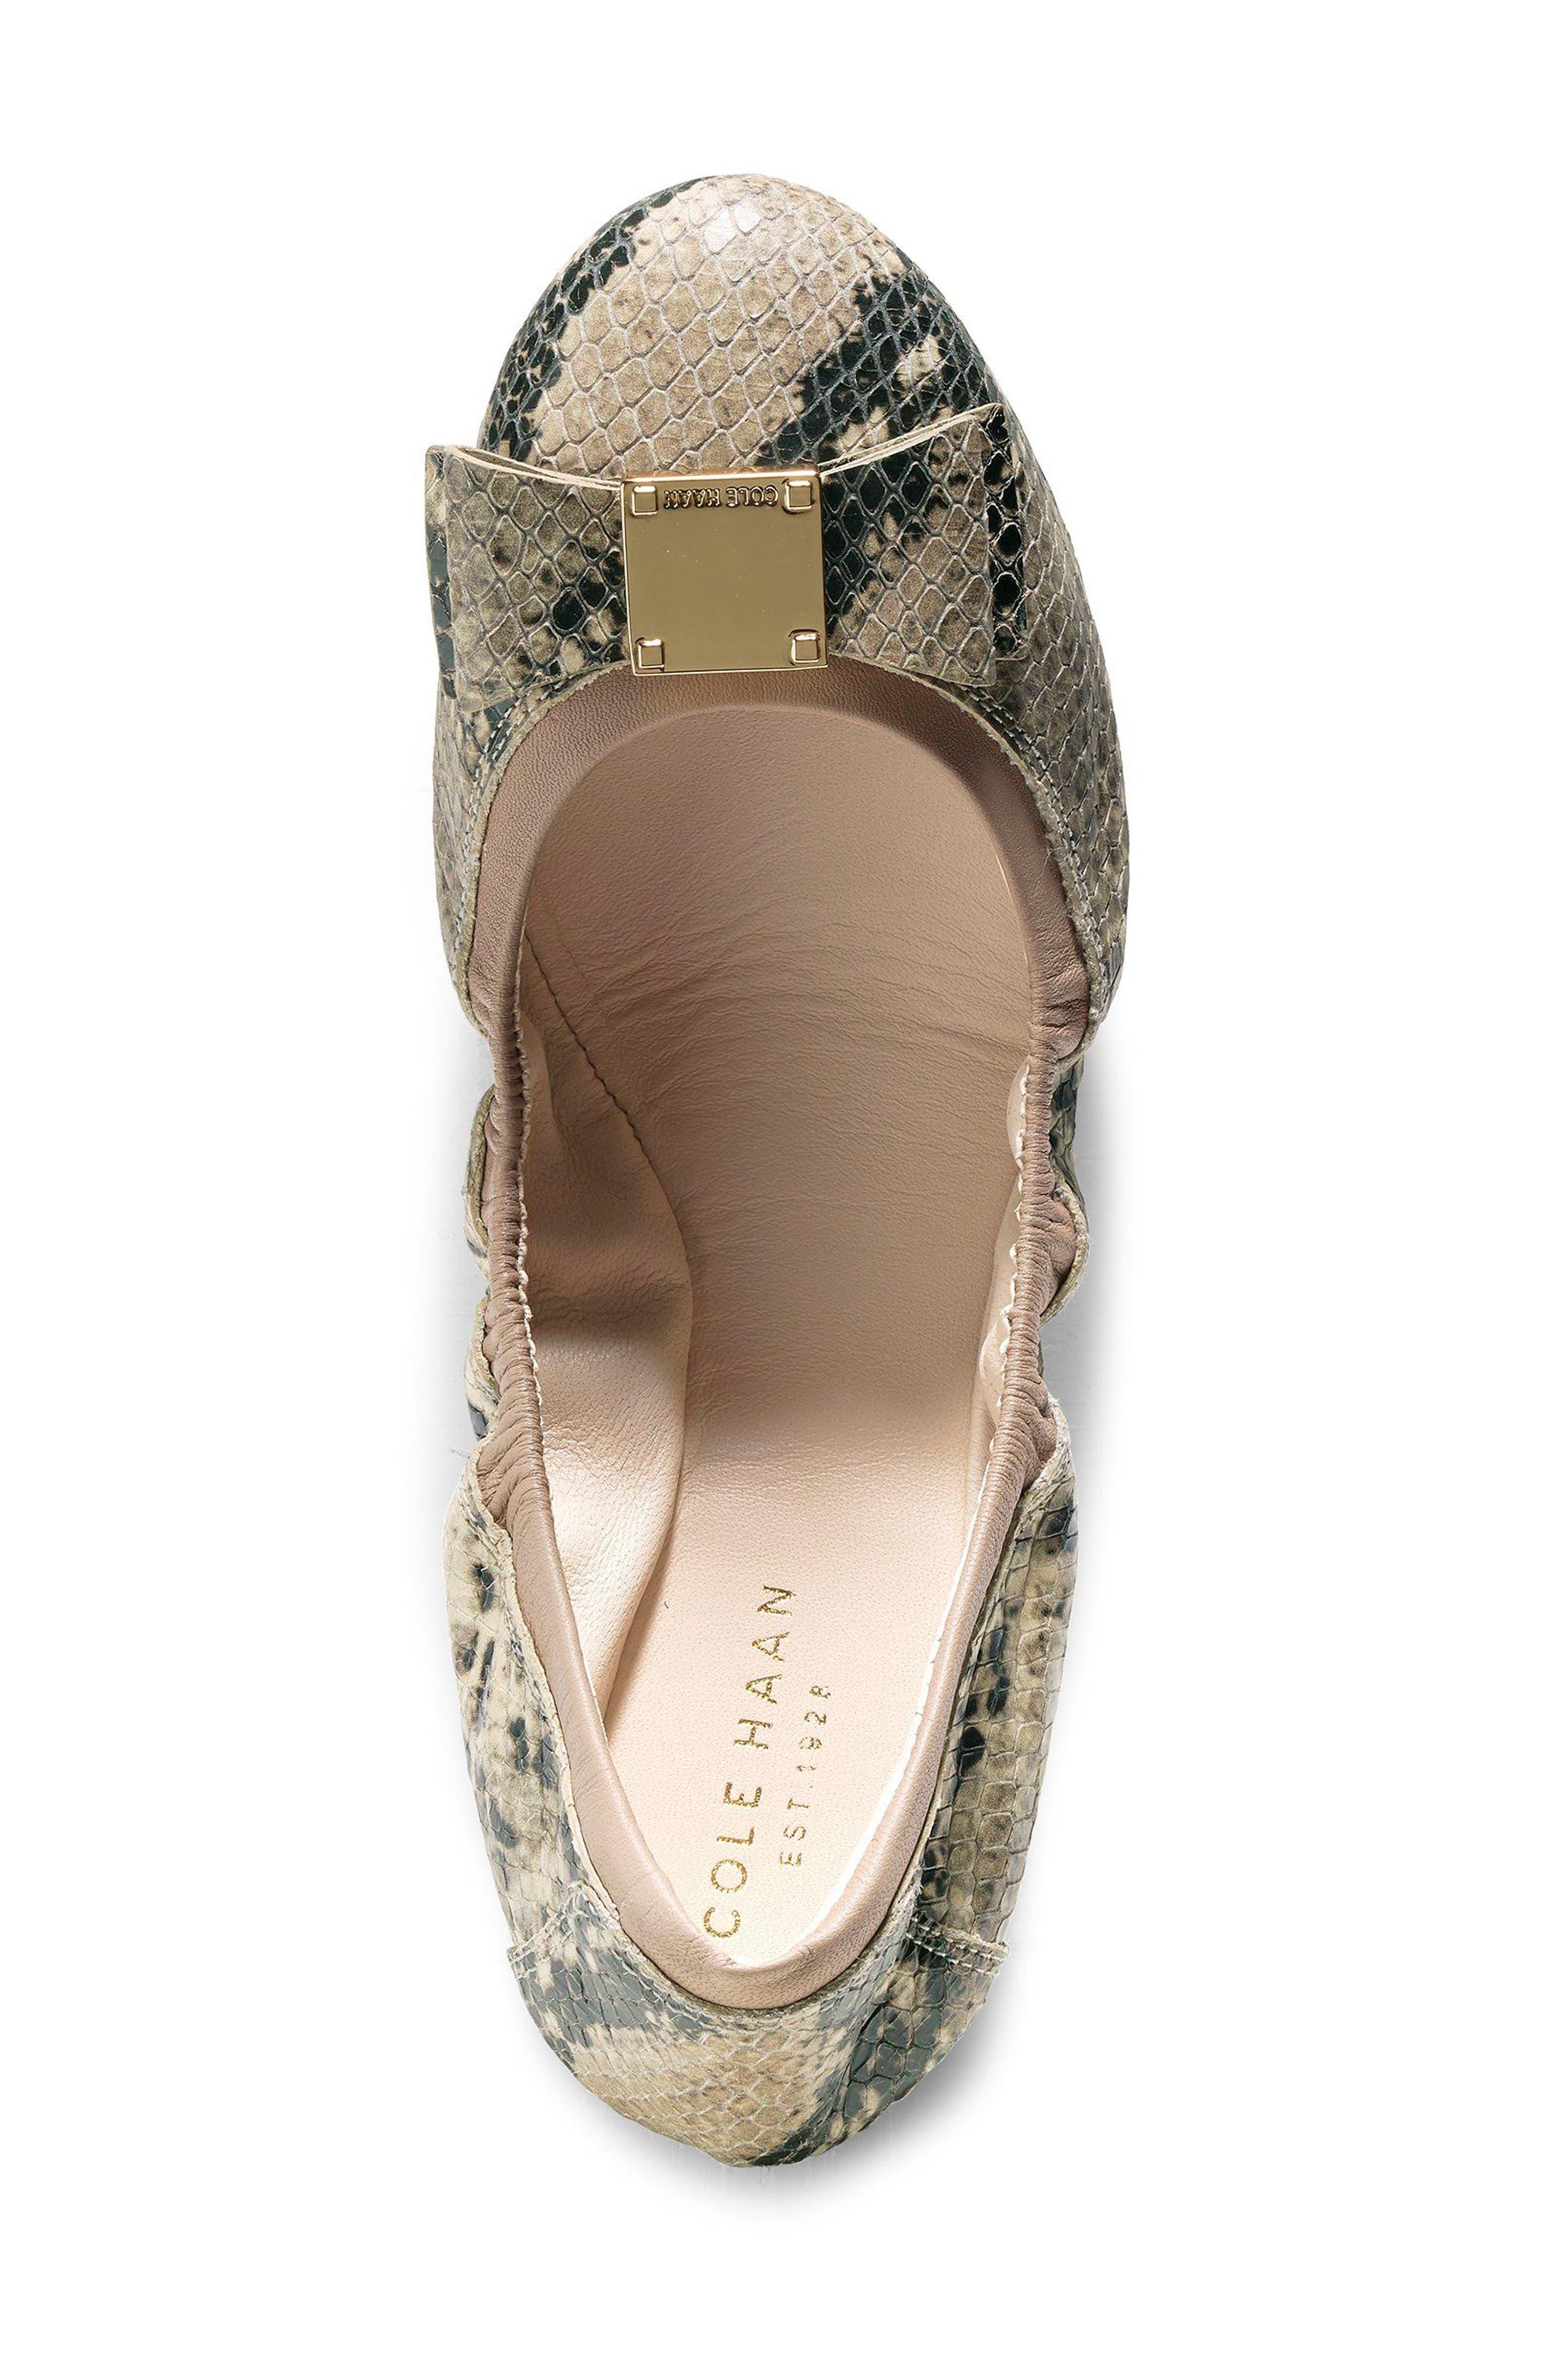 'Tali' Bow Ballet Flat,                             Alternate thumbnail 4, color,                             Roccia Snake Print Leather